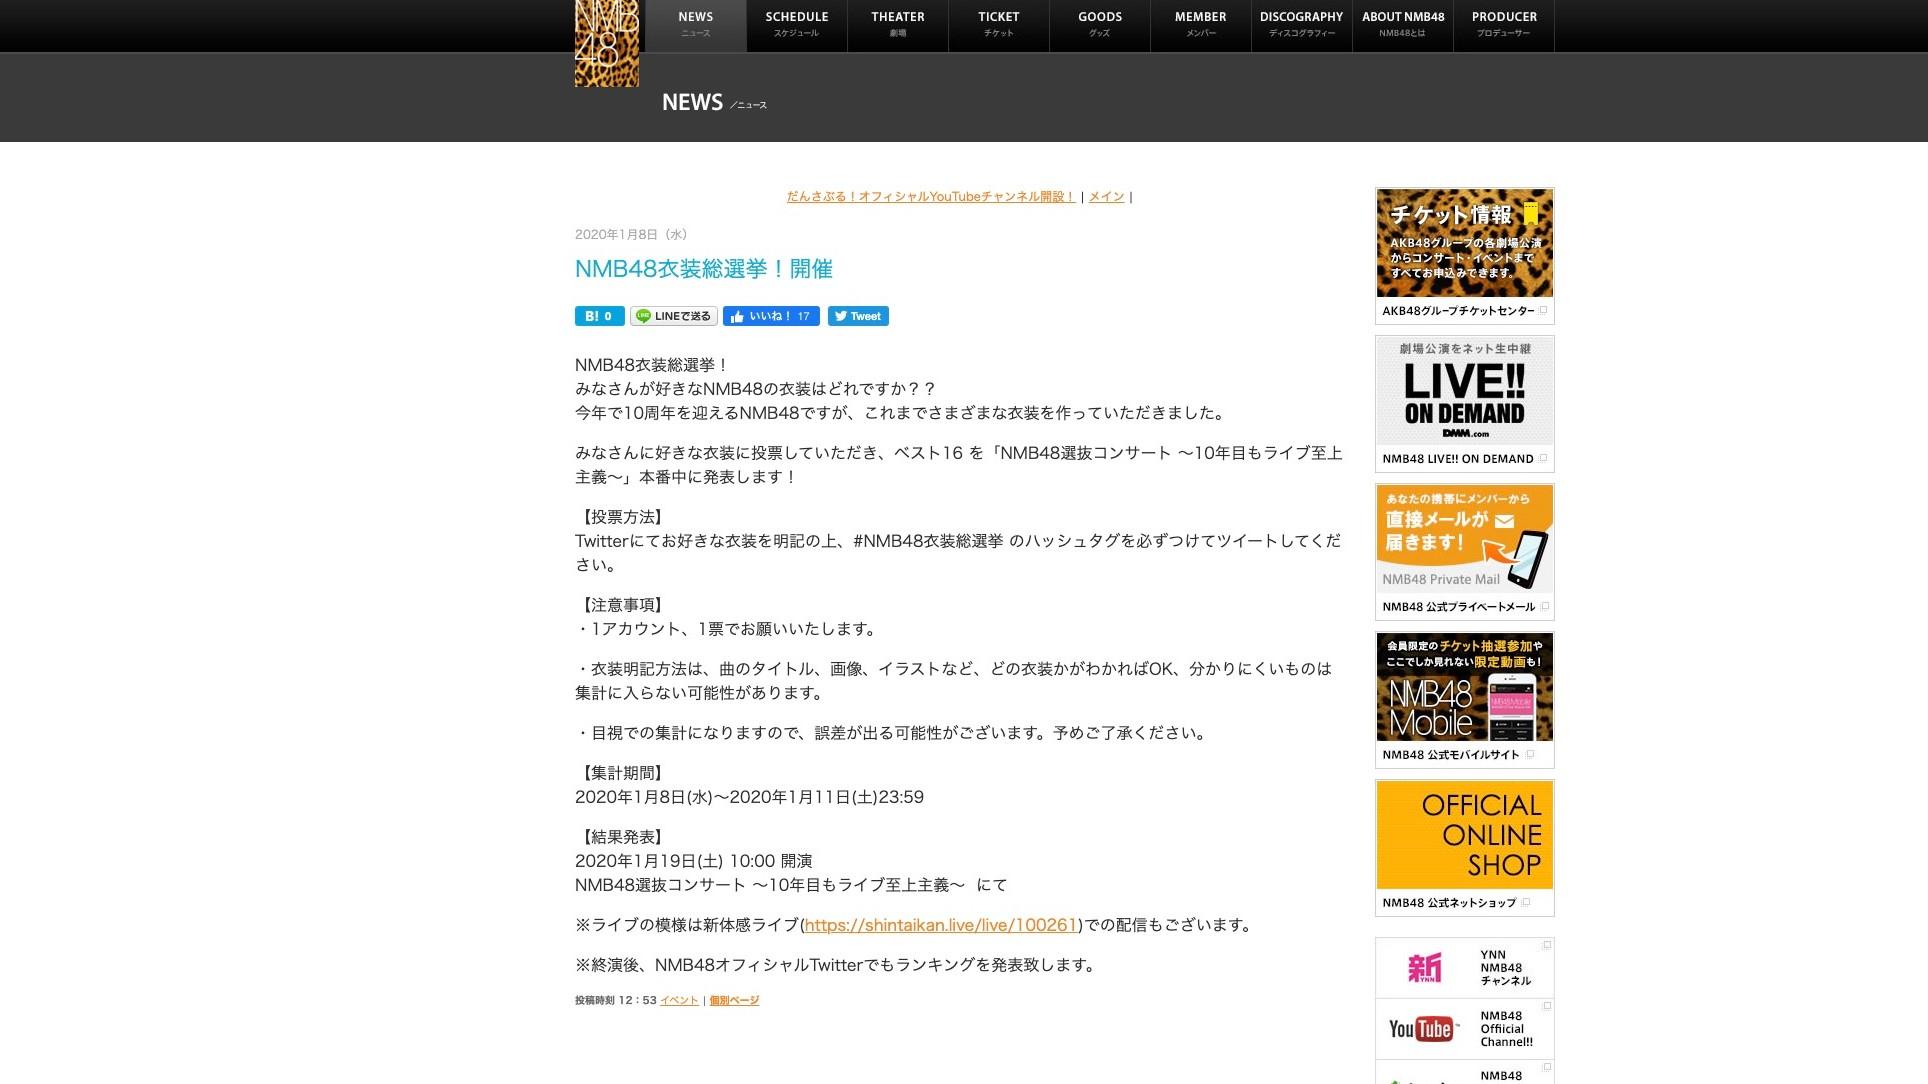 【NMB48】twitterで投票する「NMB48衣装総選挙」が開催